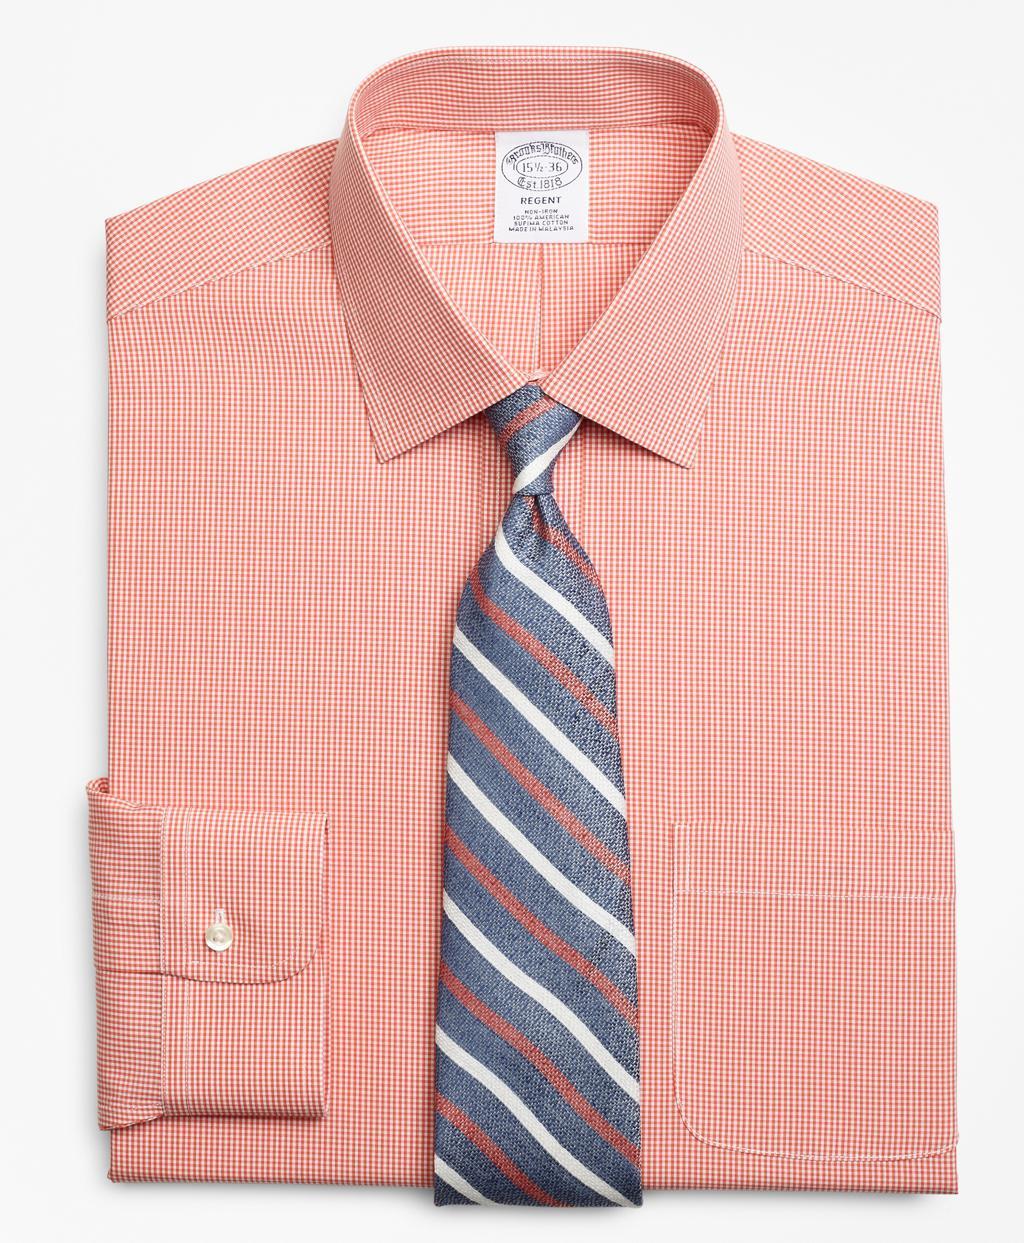 Mens Coral Gingham Dress Shirt Rockwall Auction